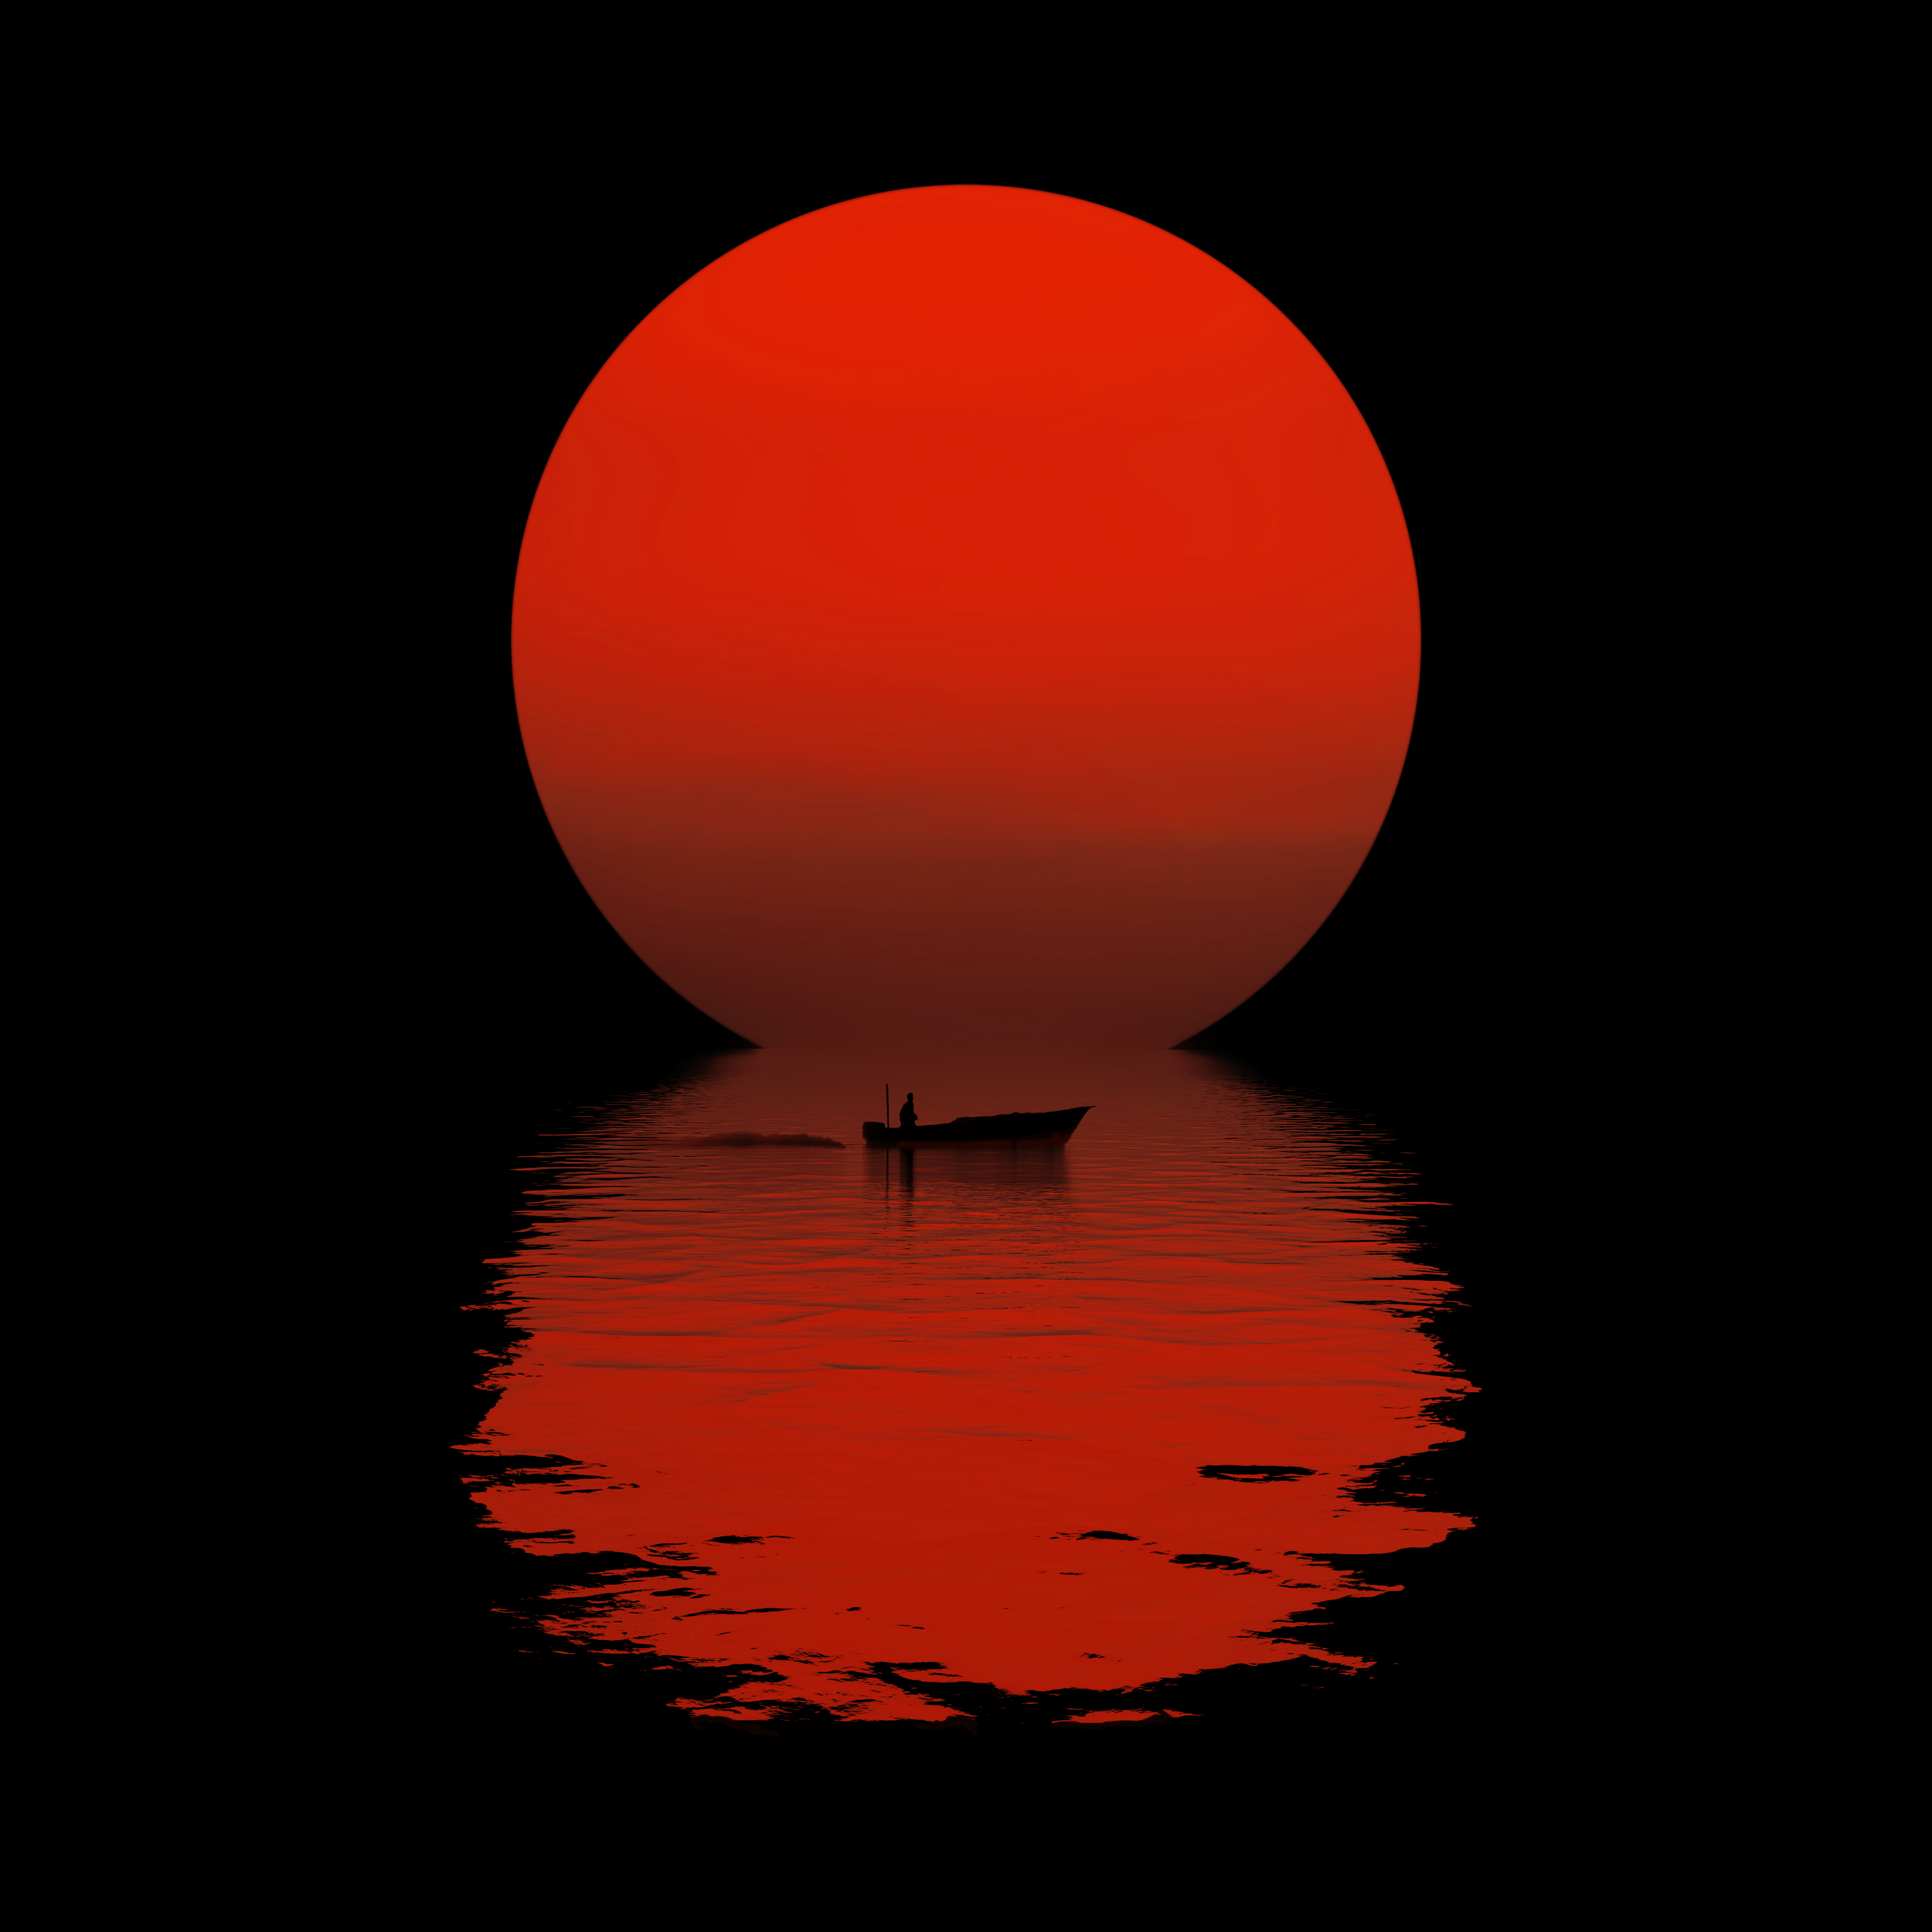 General 4500x4500 Sun black background boat dark minimalism sea simple background artwork